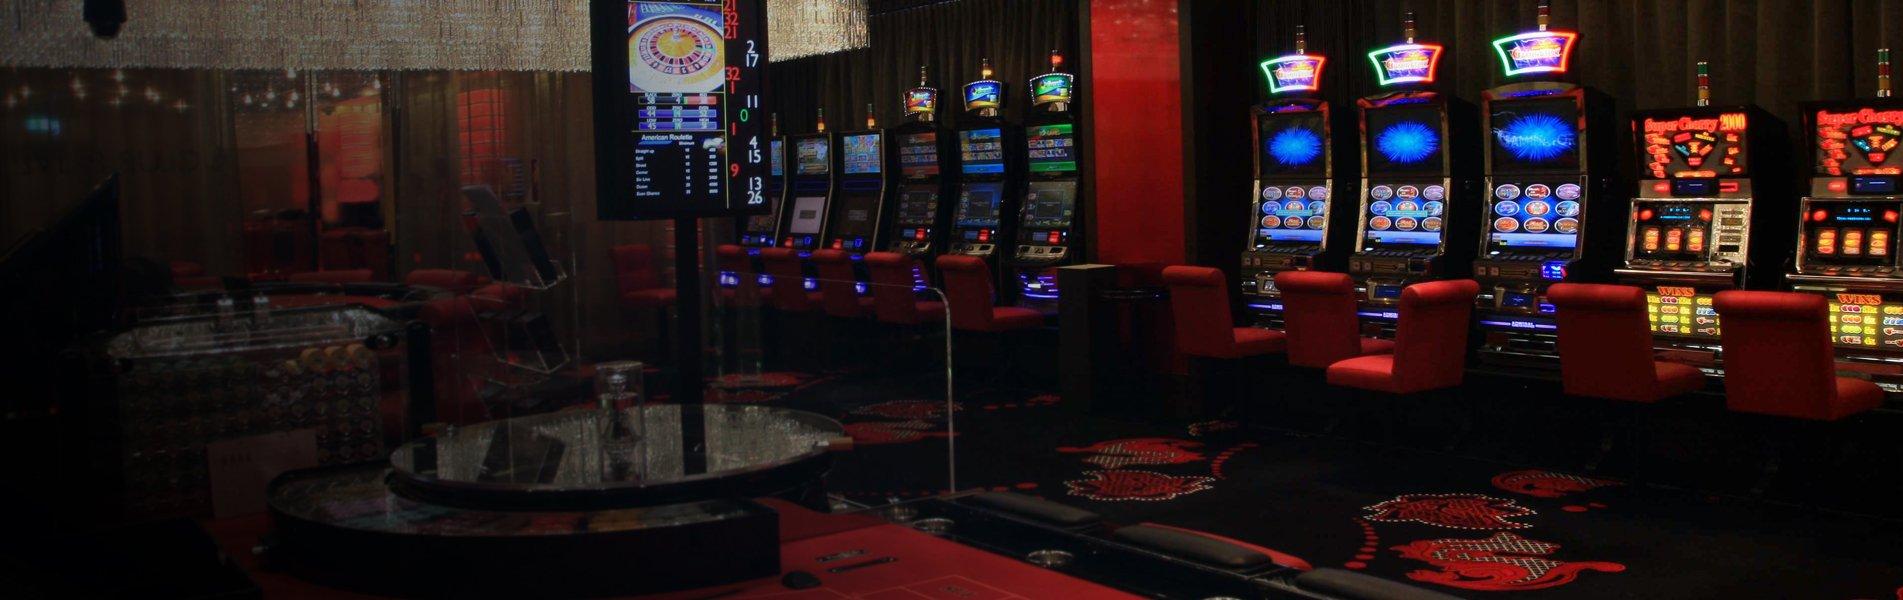 Las Vegas Spielautomaten 596030